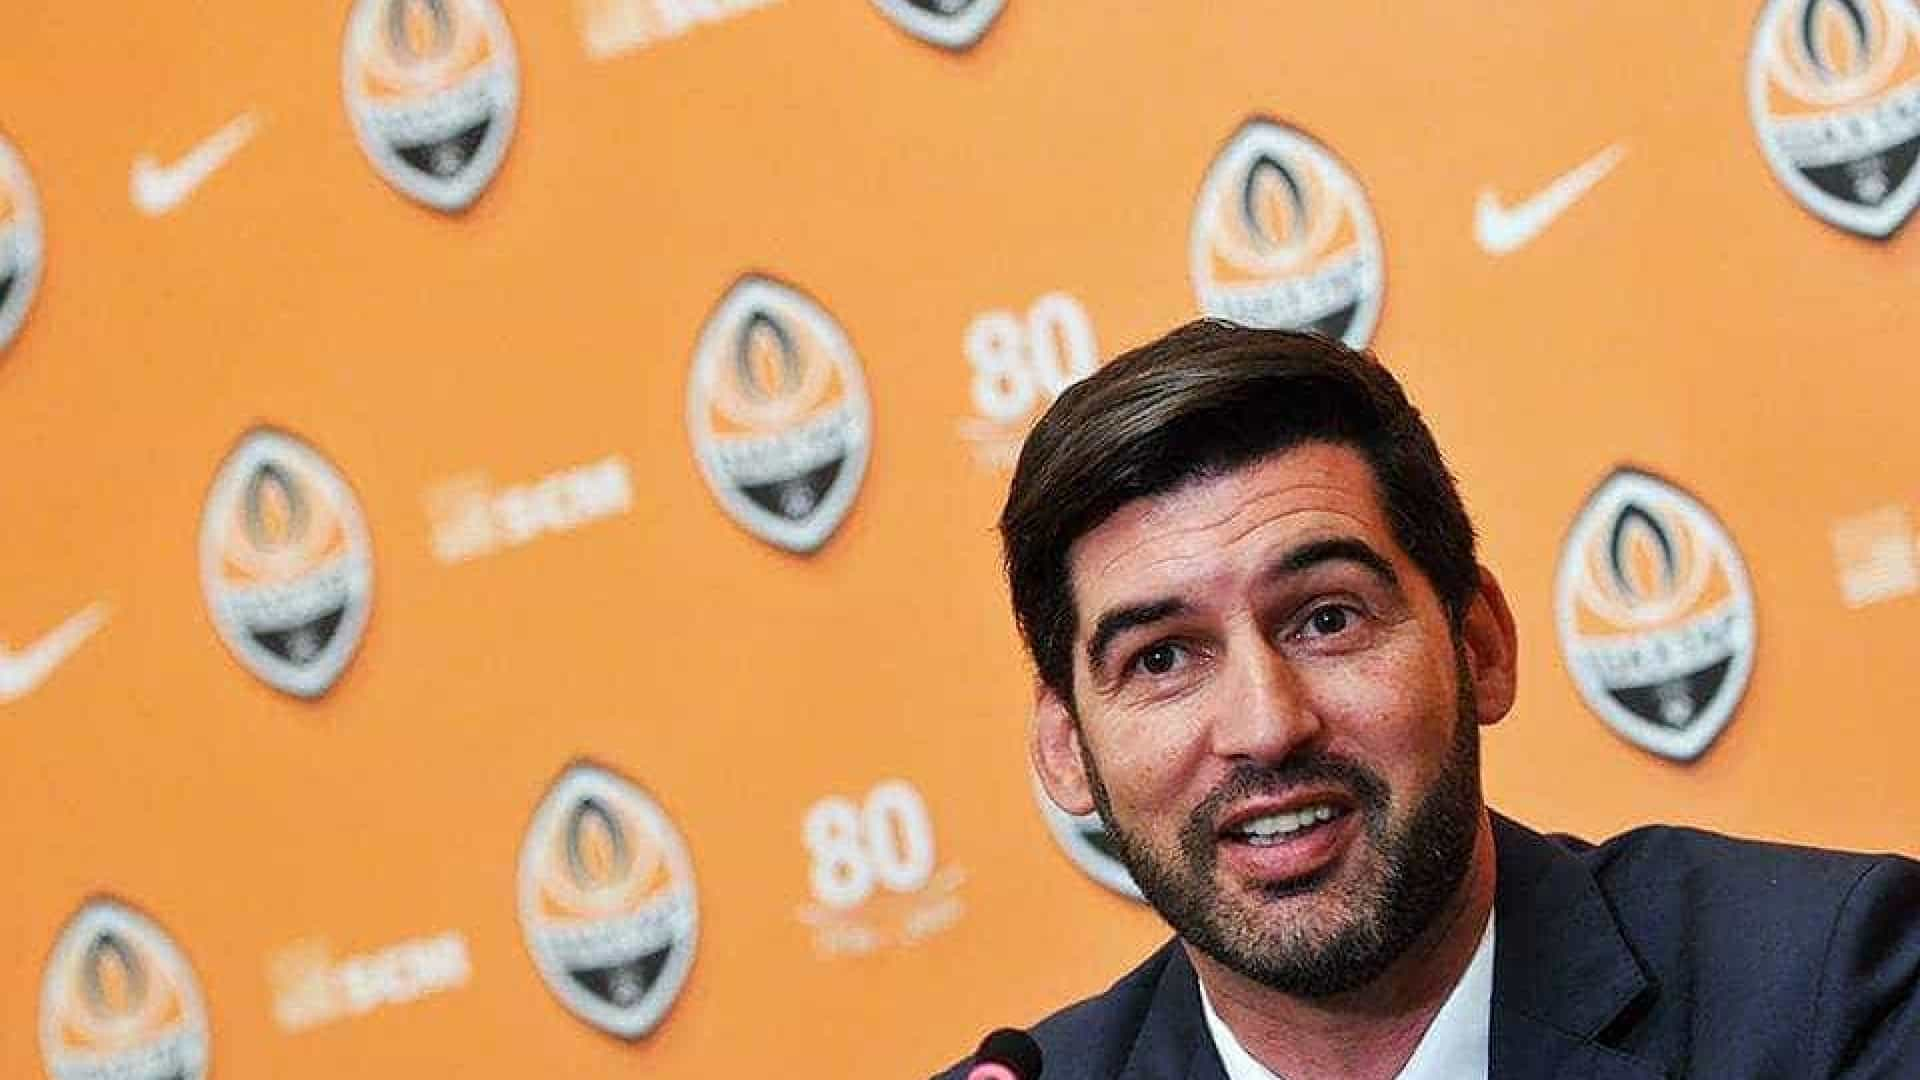 Premier League continua a chamar por... Paulo Fonseca